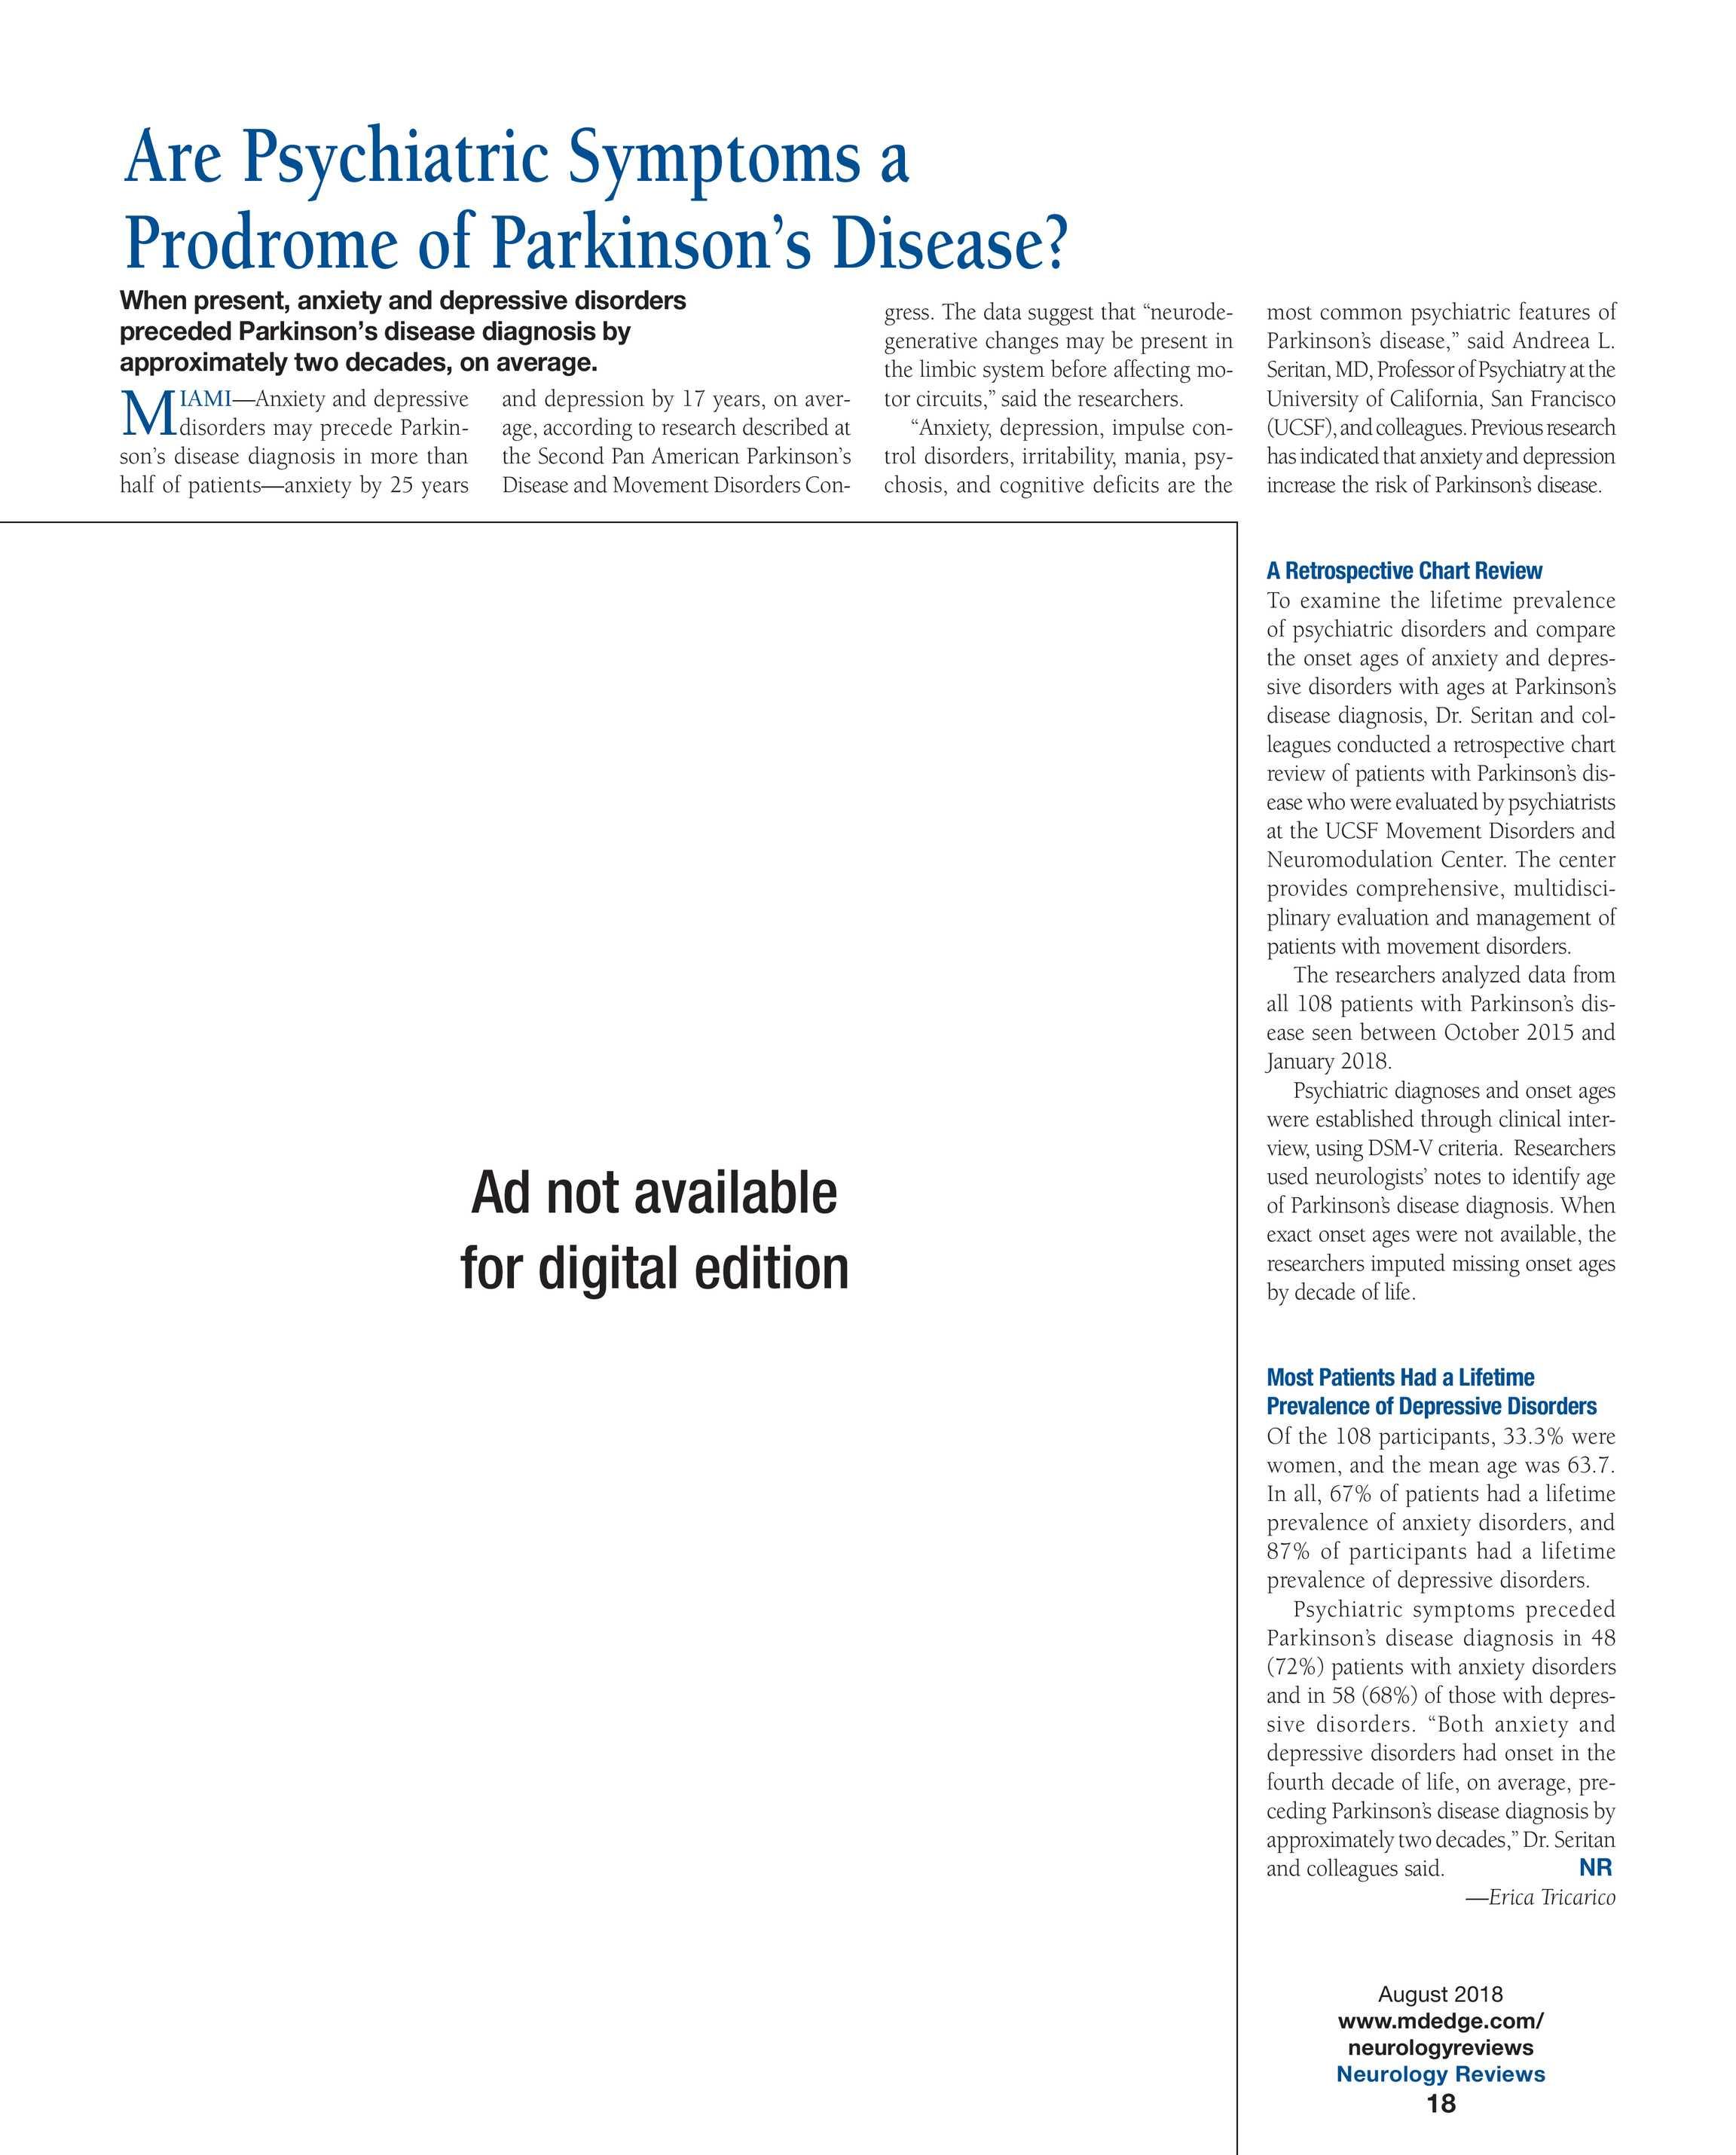 Neurology Reviews - NR Aug 2018 - page 18